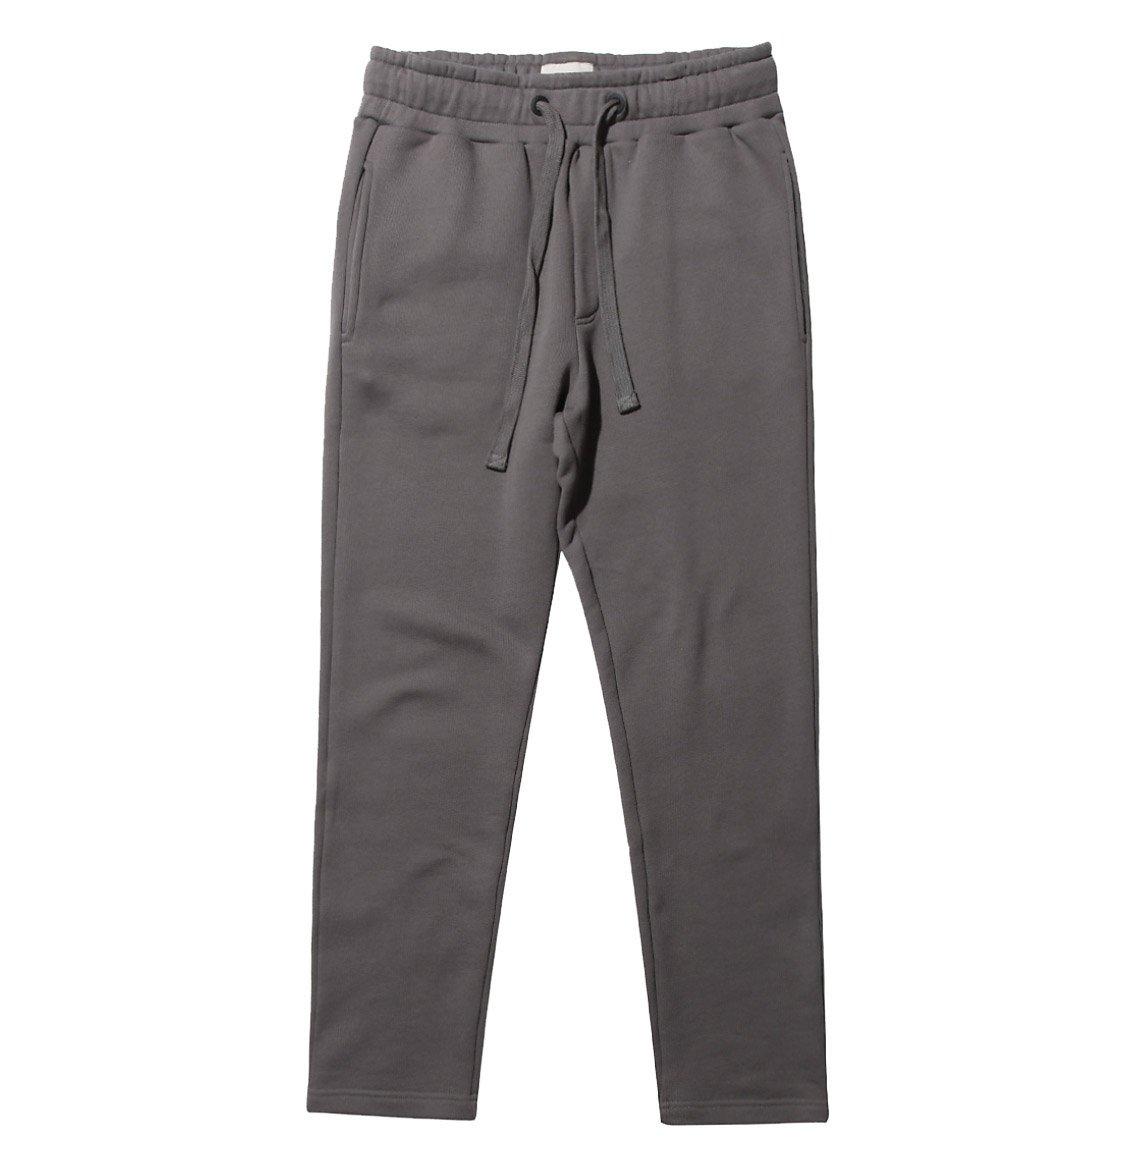 The Project Garments Loose Fit Cotton Sweatpants Moonrock Grey